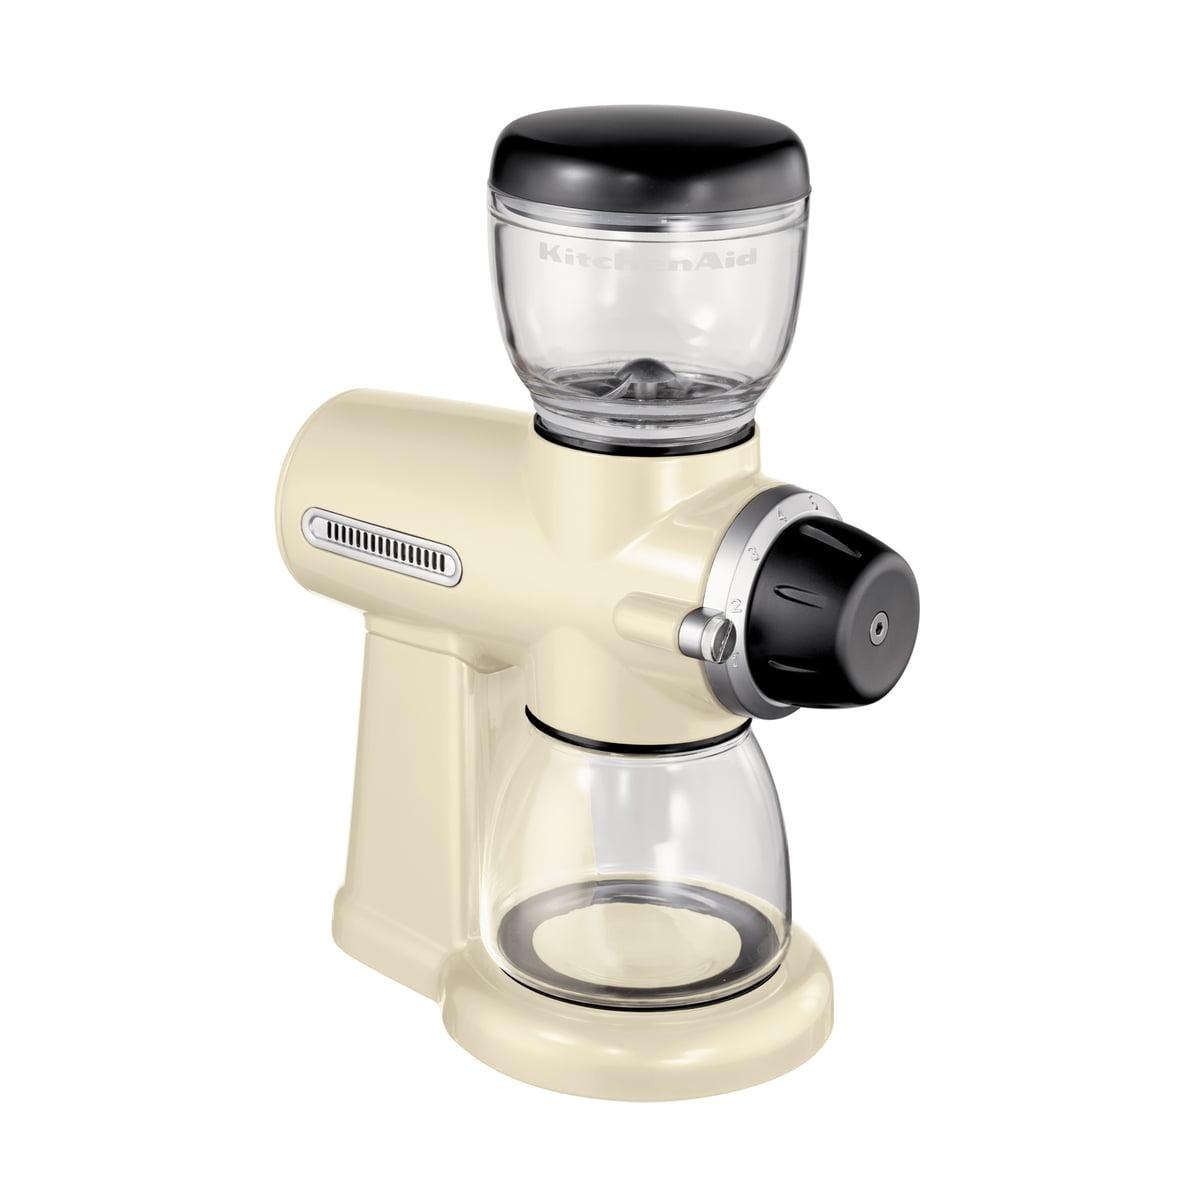 Kitchenaid Artisan Coffee Grinder